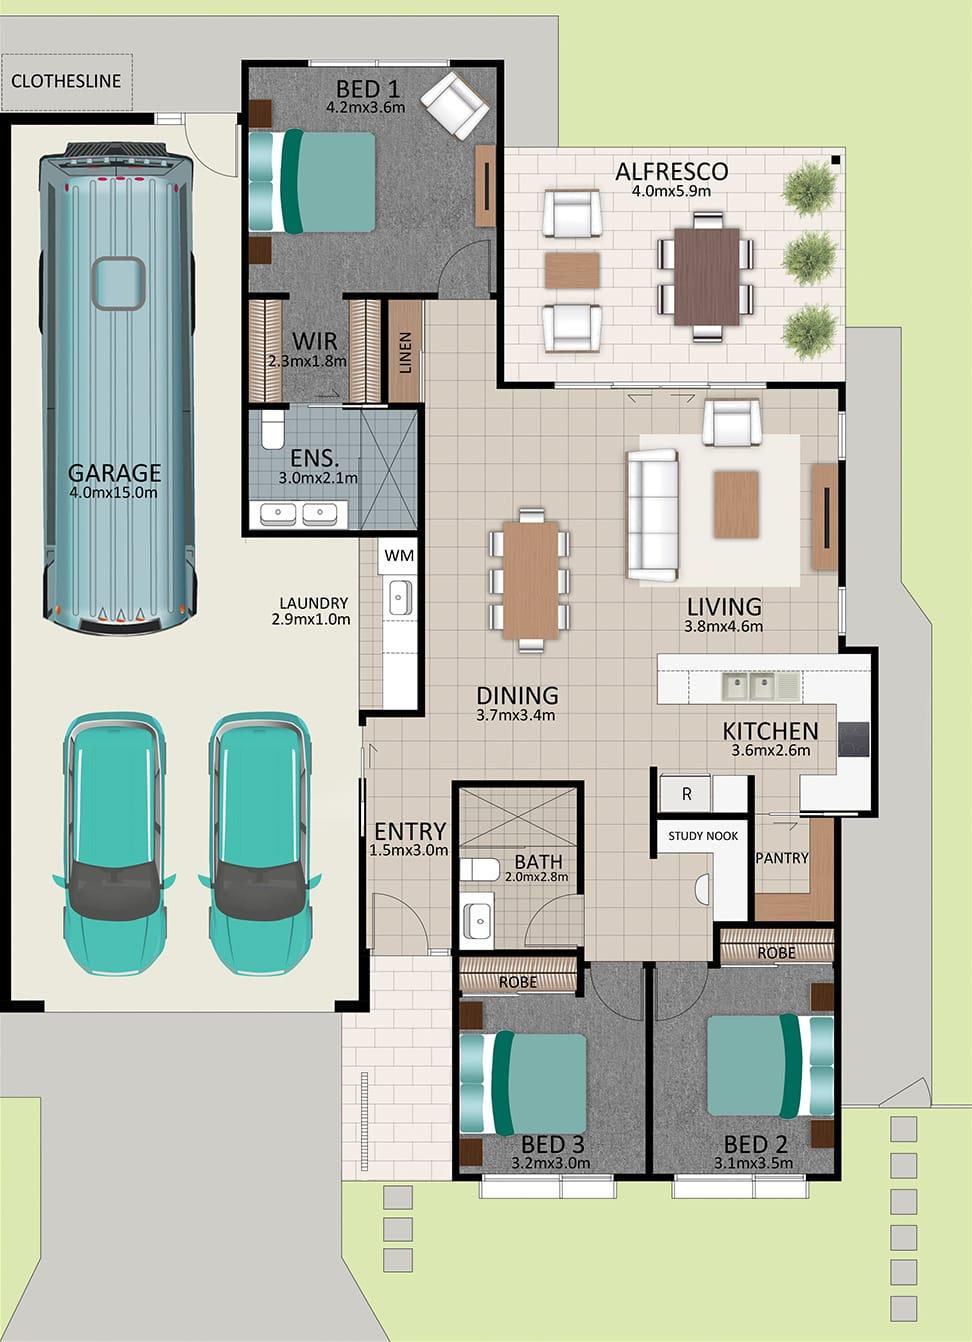 LR WEB LAT25 Floorplan LOT 180 Watson MK3 NOV19 - Lot 180